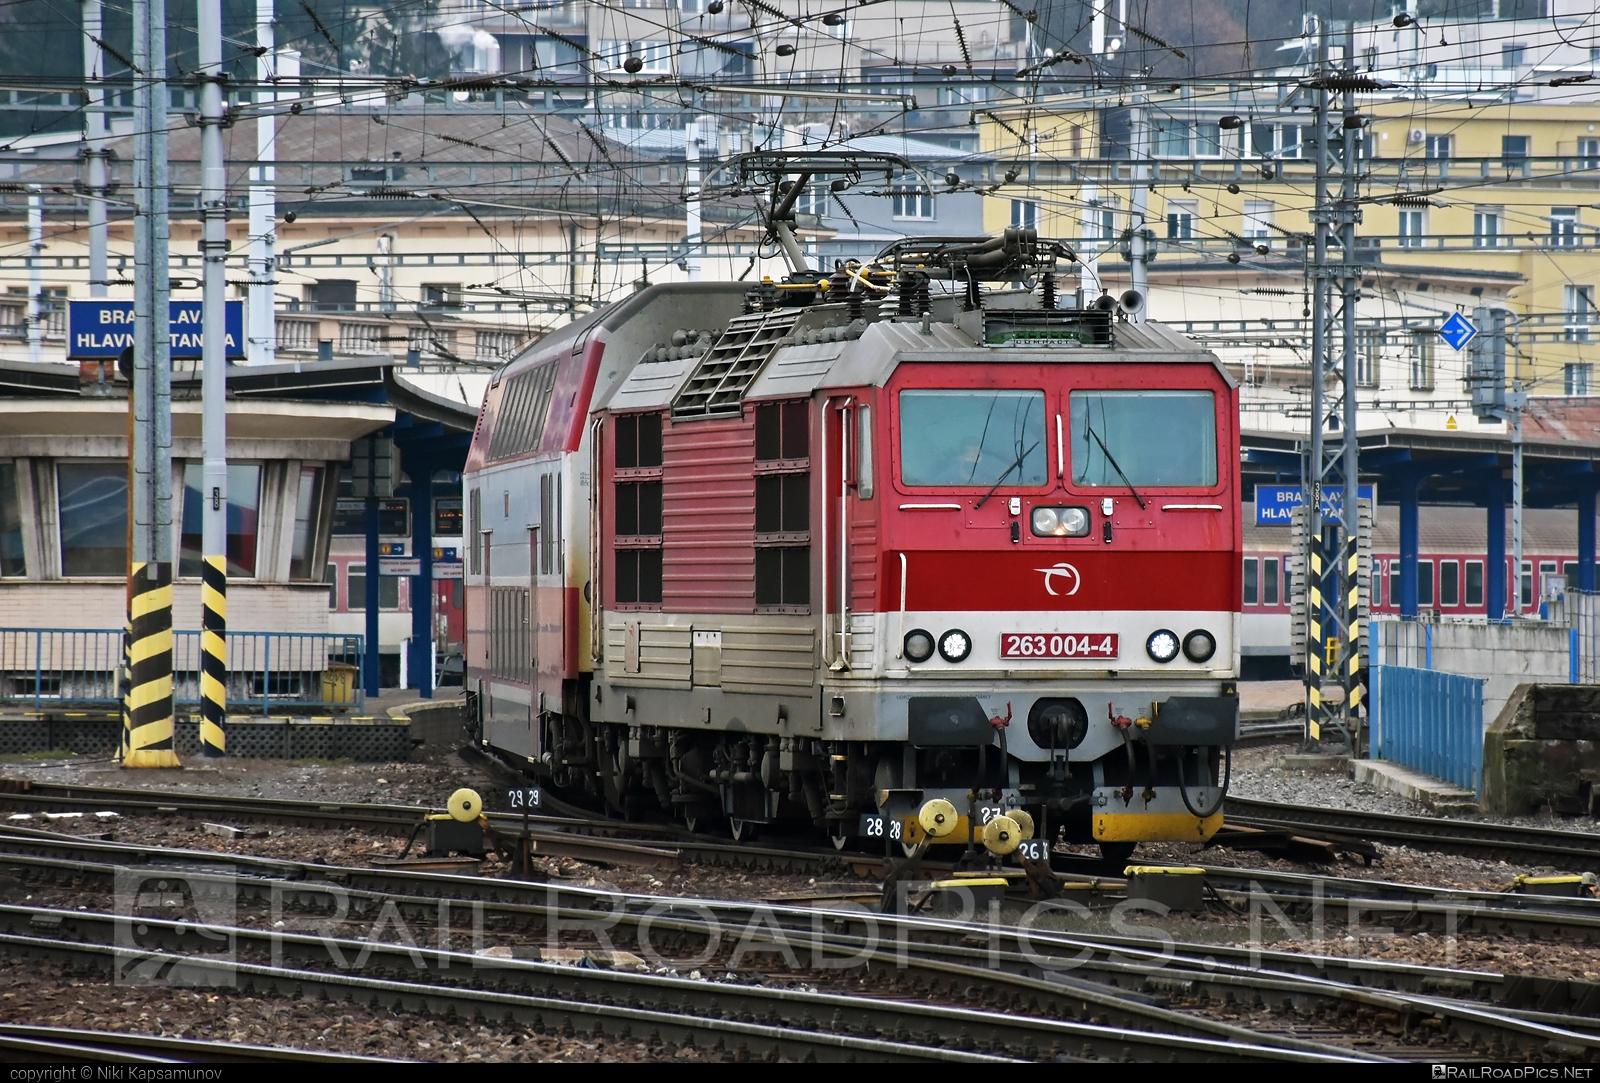 Škoda 70E - 263 004-4 operated by Železničná Spoločnost' Slovensko, a.s. #ZeleznicnaSpolocnostSlovensko #locomotive263 #princezna #skoda #skoda70e #zssk